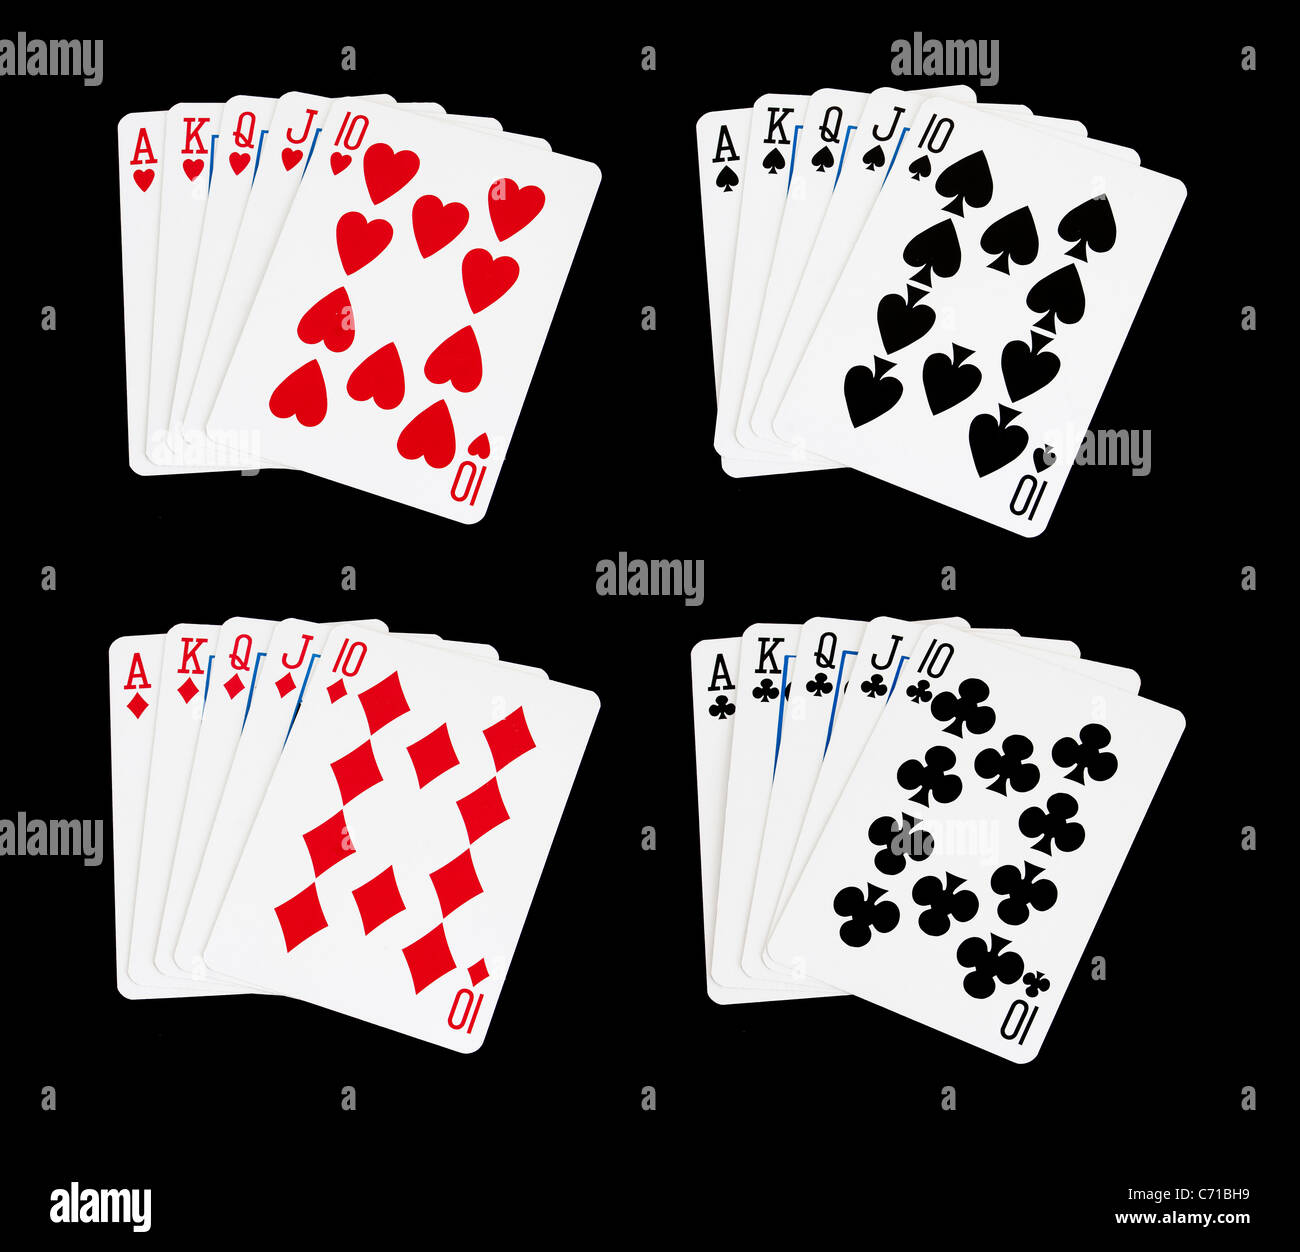 Poker flush vs flush promotions casino de montreal